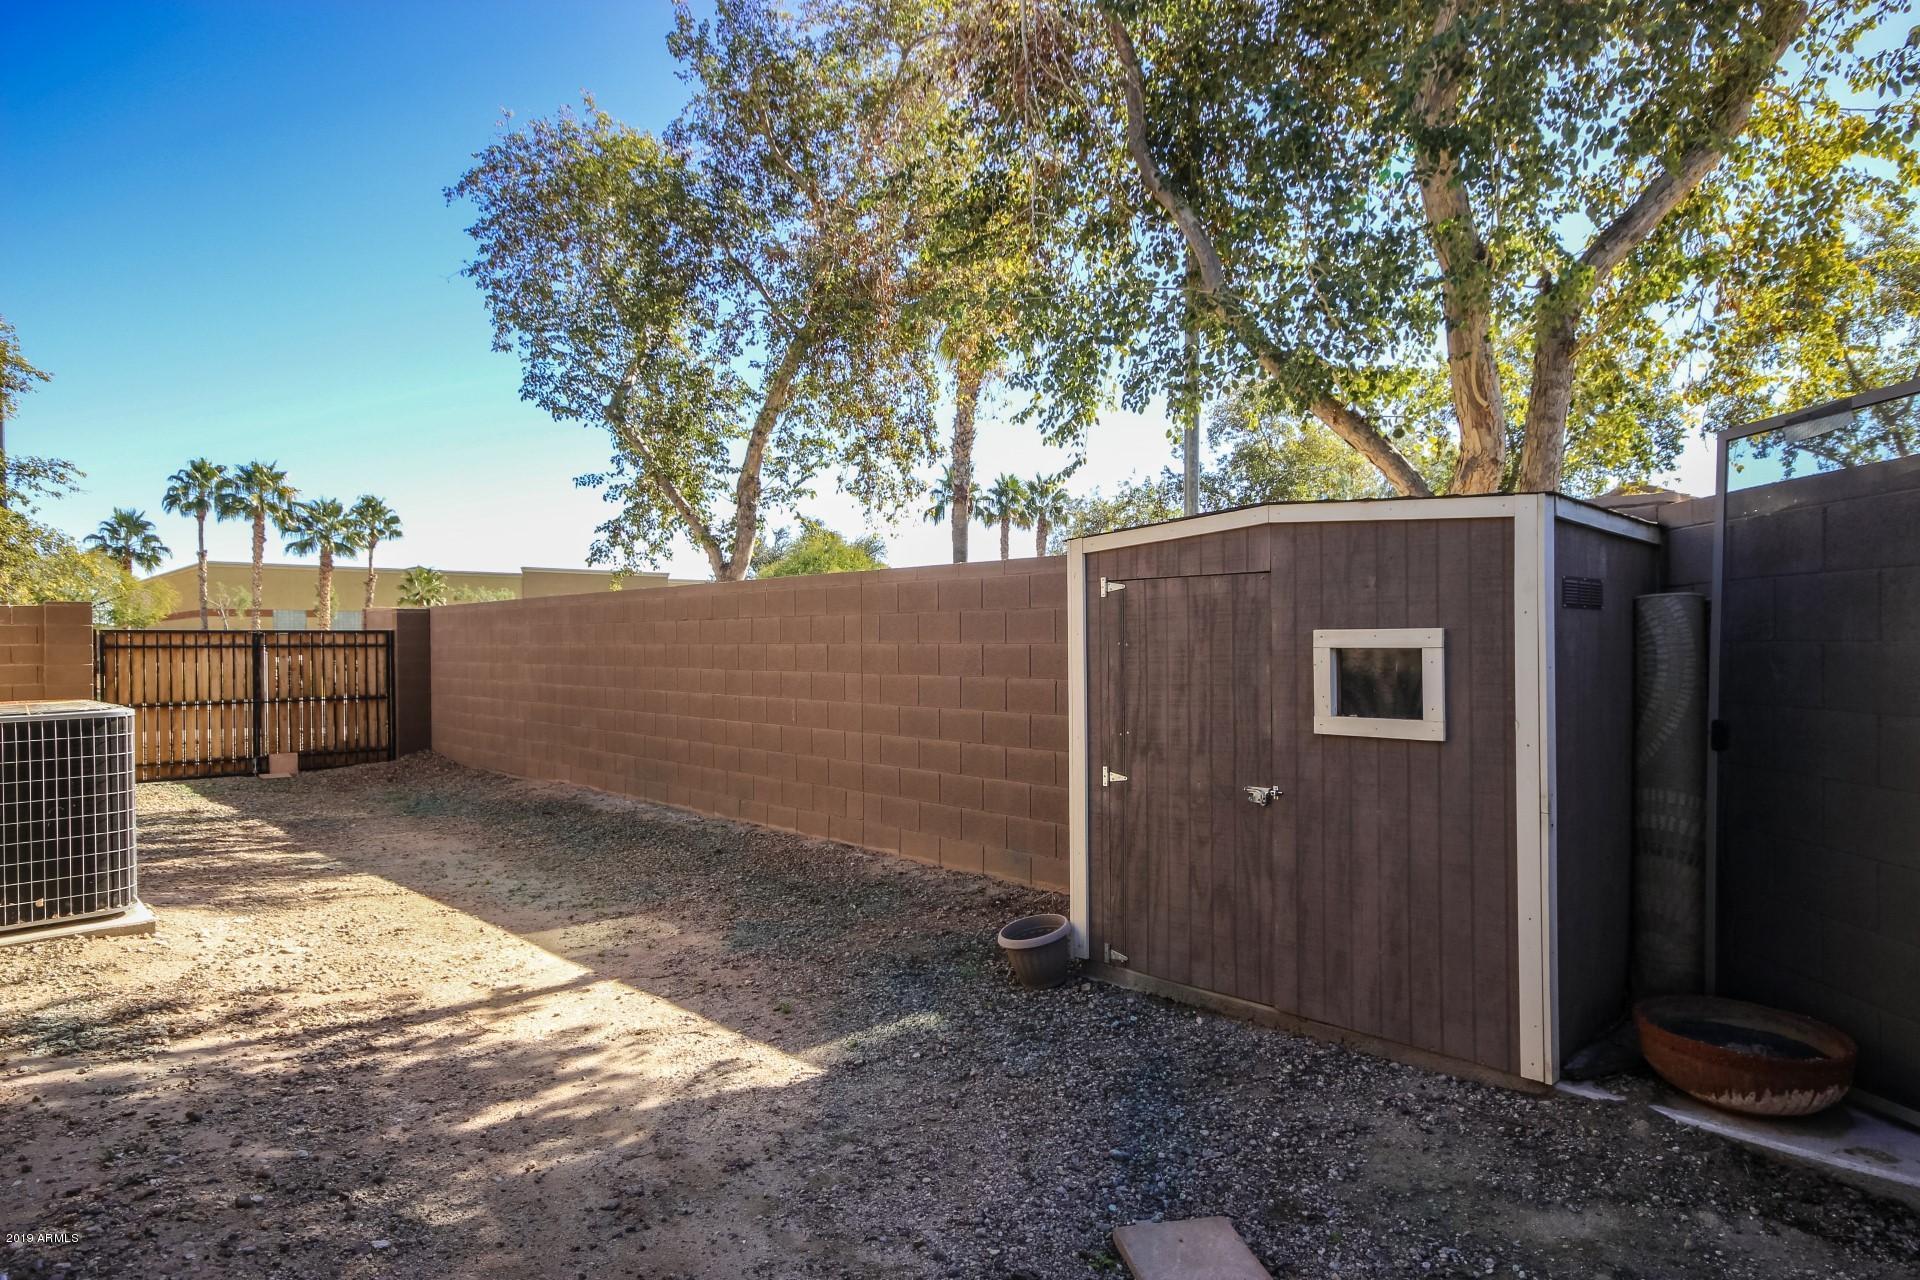 MLS 5874680 1286 S 172ND Lane, Goodyear, AZ 85338 Goodyear AZ Cottonflower